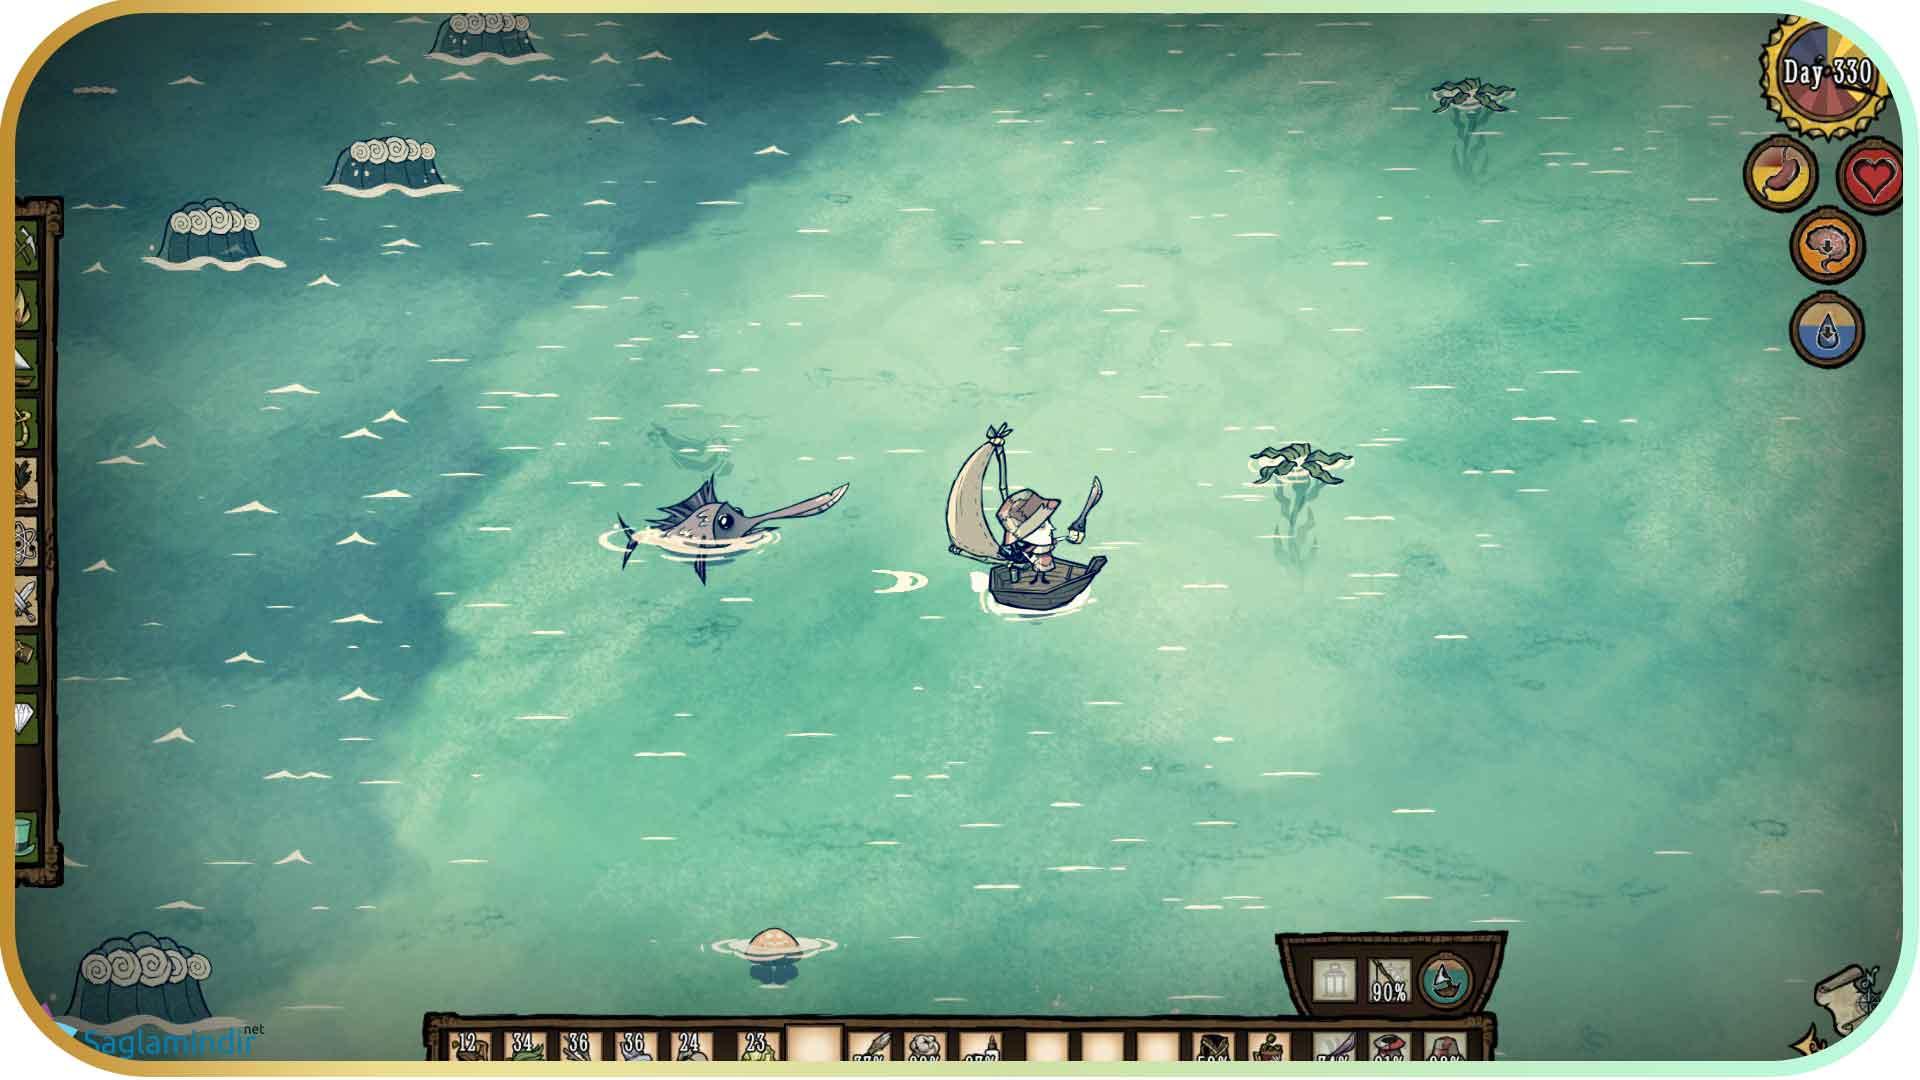 Don't Starve Shipwrecked saglamindir